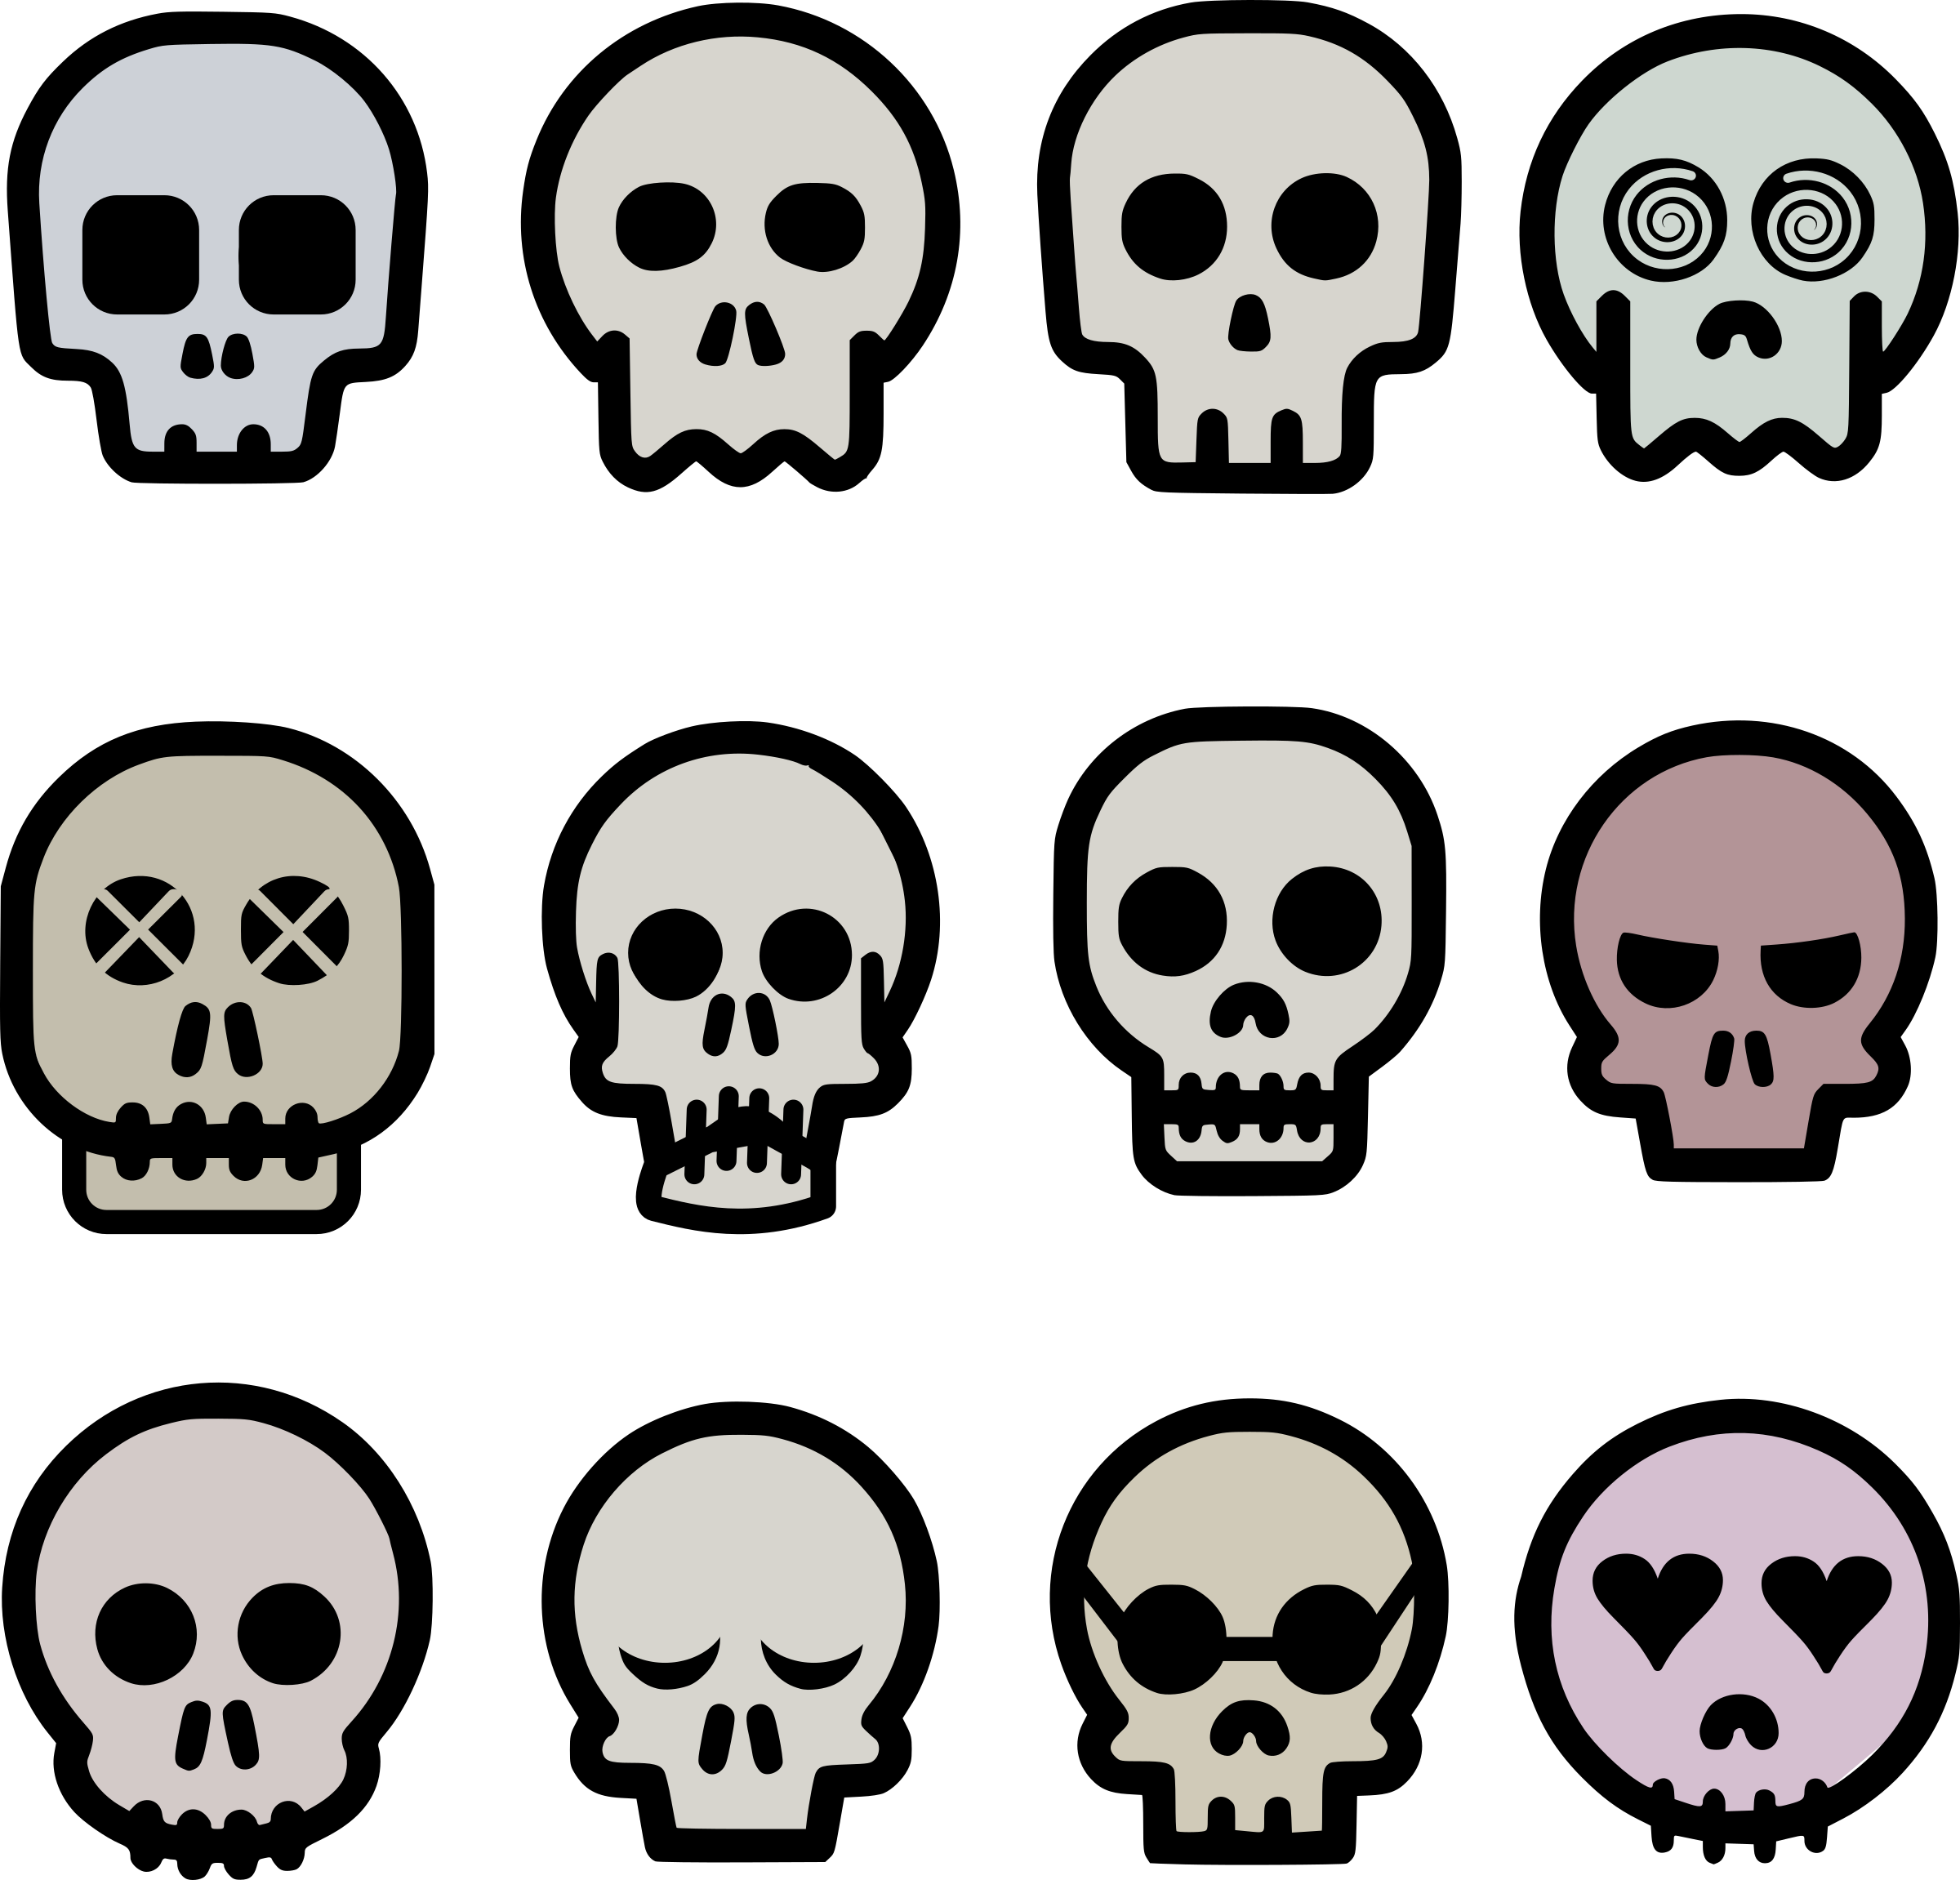 Skull big image png. Bone clipart emoji